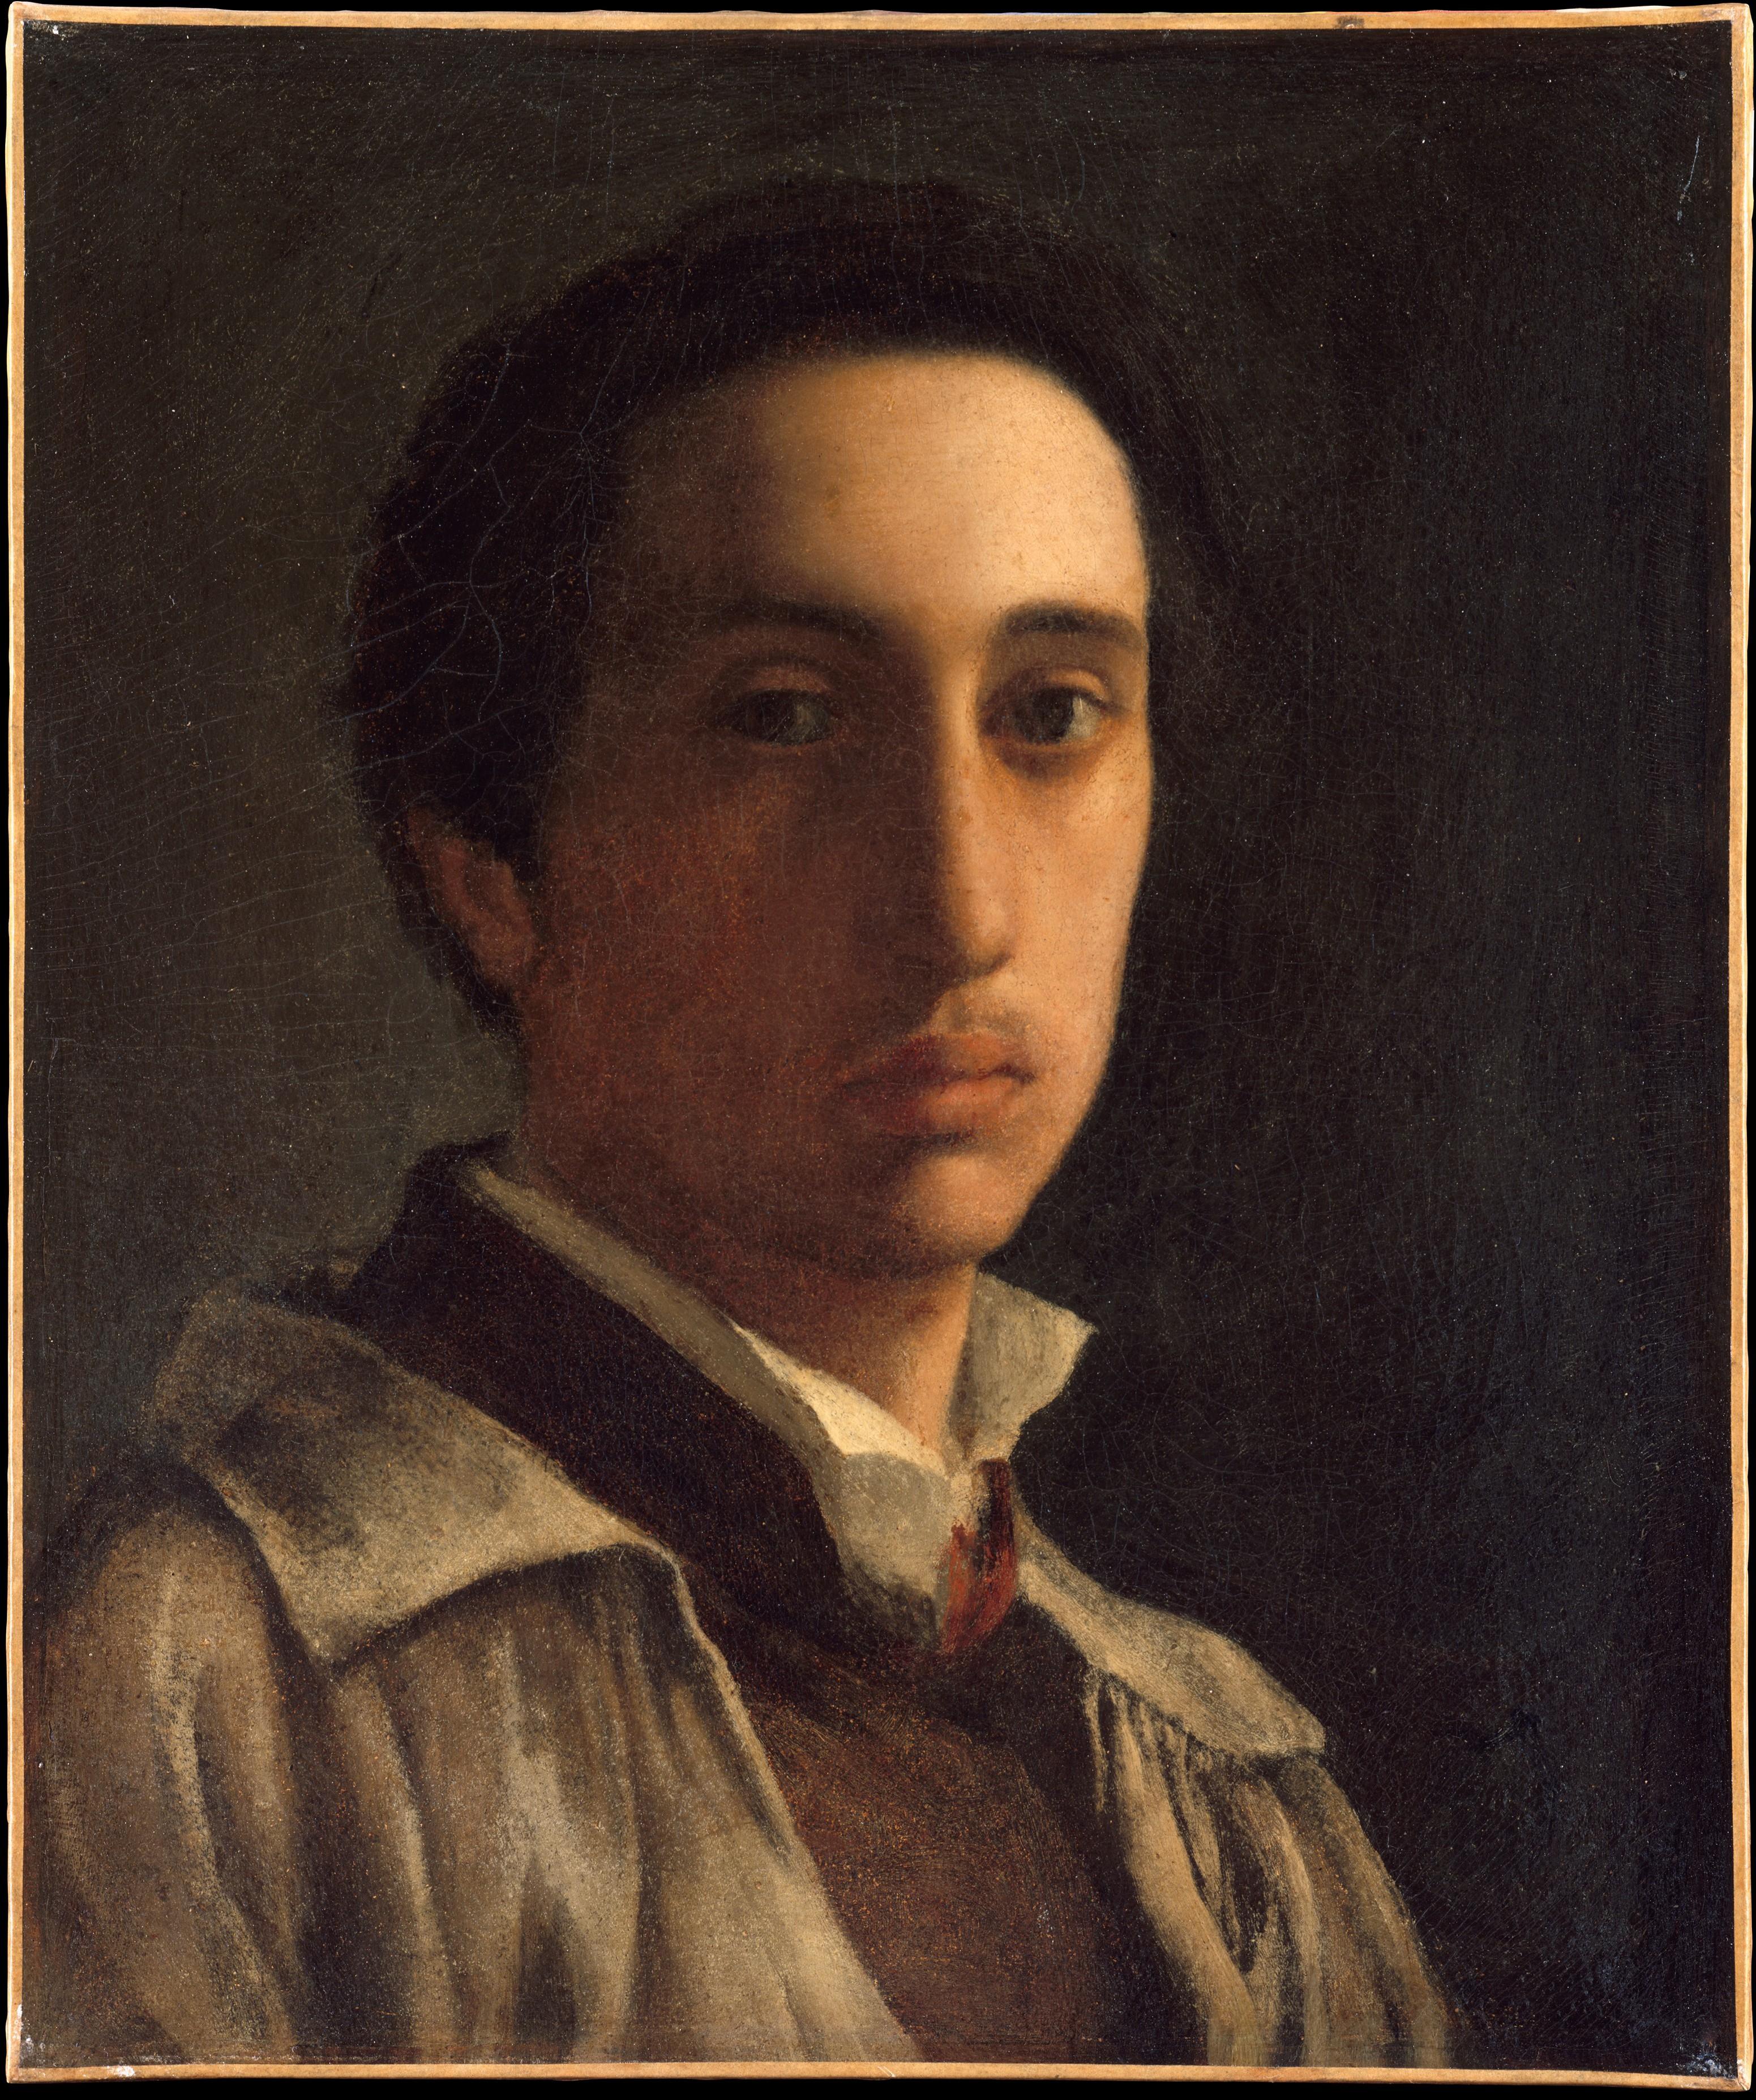 Edgar Degas | Self-Portrait | The Met